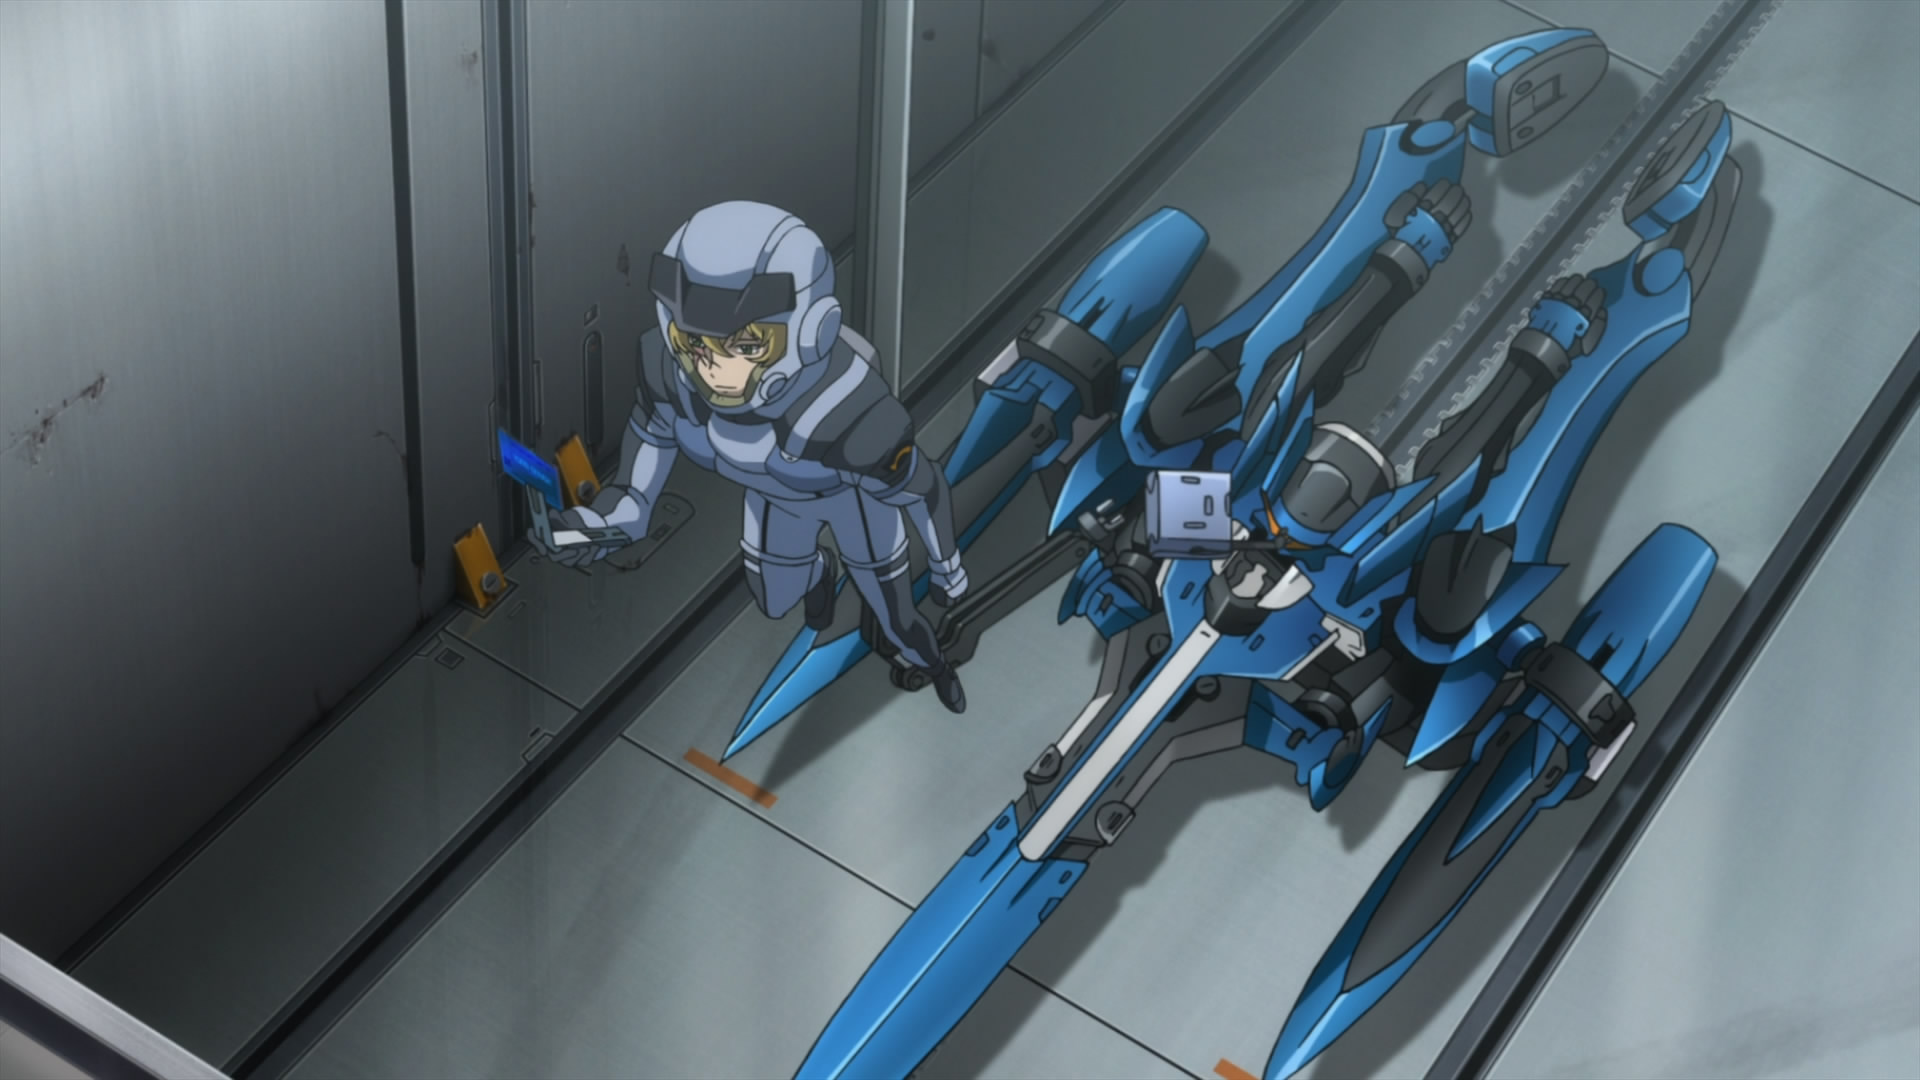 [gSS]_Mobile_Suit_Gundam_00_-_A_wakening_of_the_Trailblazer_(1080p)_[2B252856].mkv_snapshot_00.26.21_[2011.01.07_04.17.20]